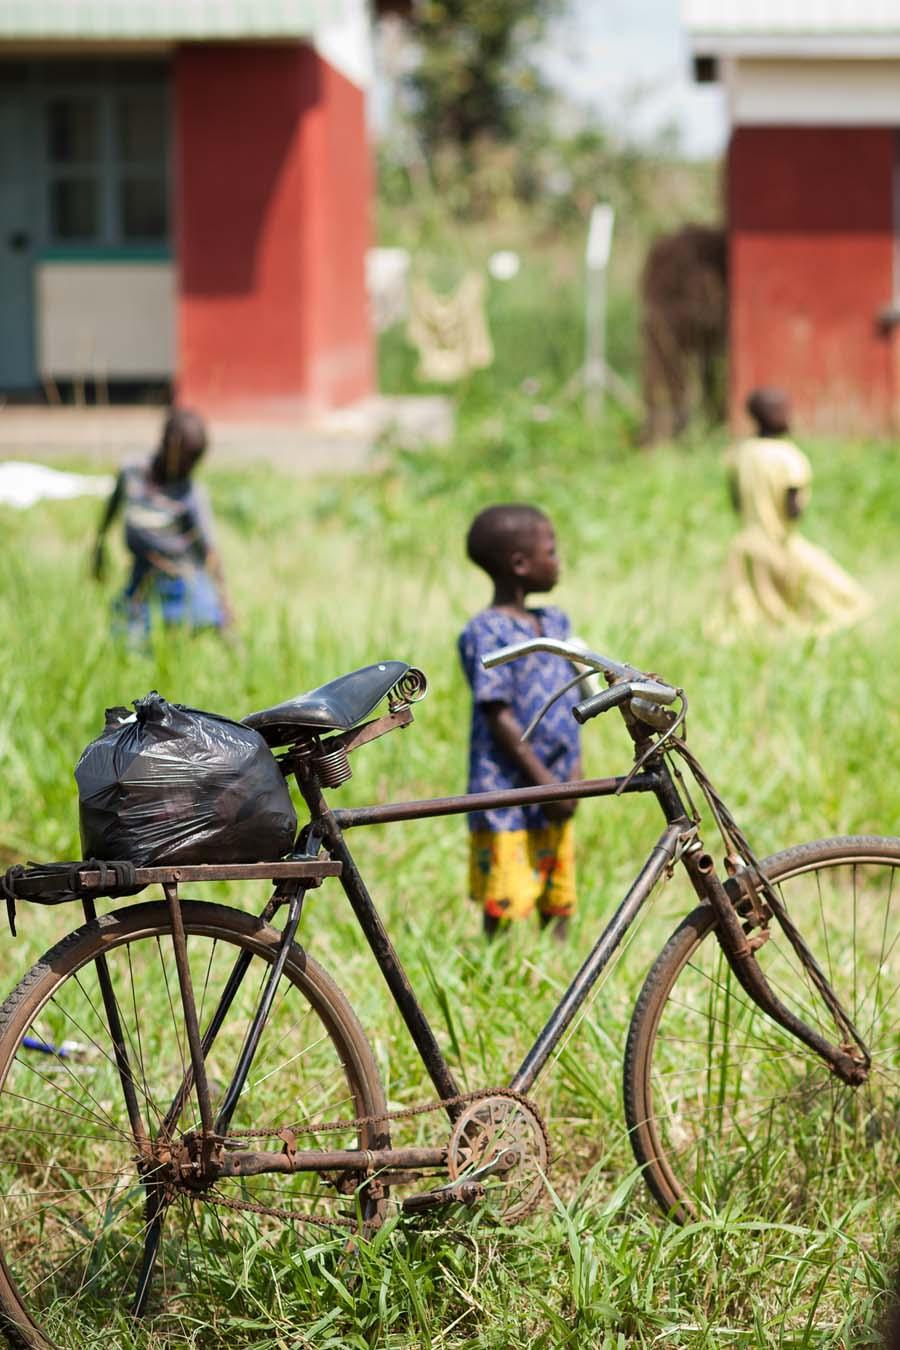 jessicadavisphotography.com | Jessica Davis Photography | Portrait Work in Uganda| Travel Photographer | World Event Photographs 7 (1).jpg